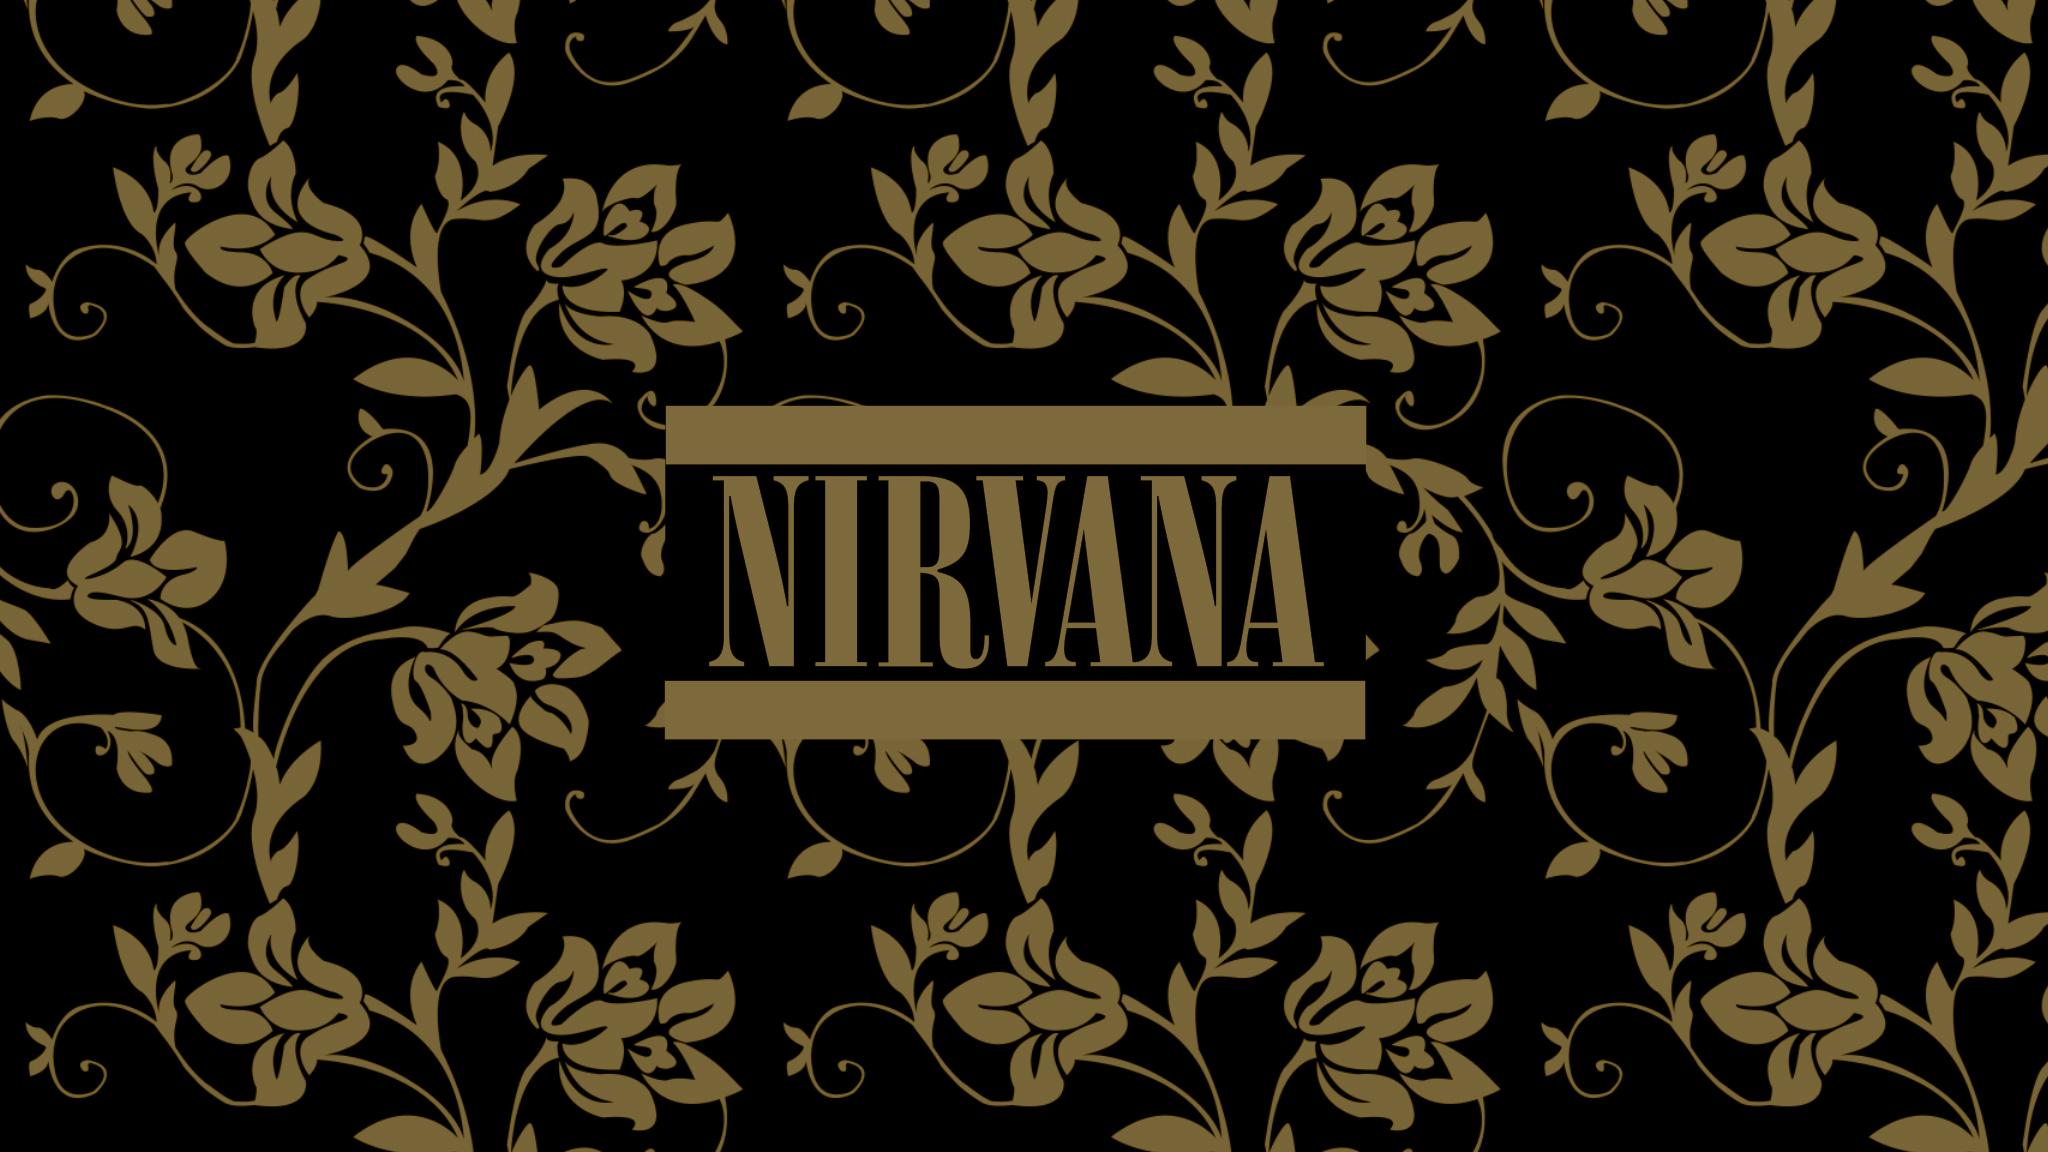 nirvana wallpaper by razielthe9th customization wallpaper other 2012 2048x1152